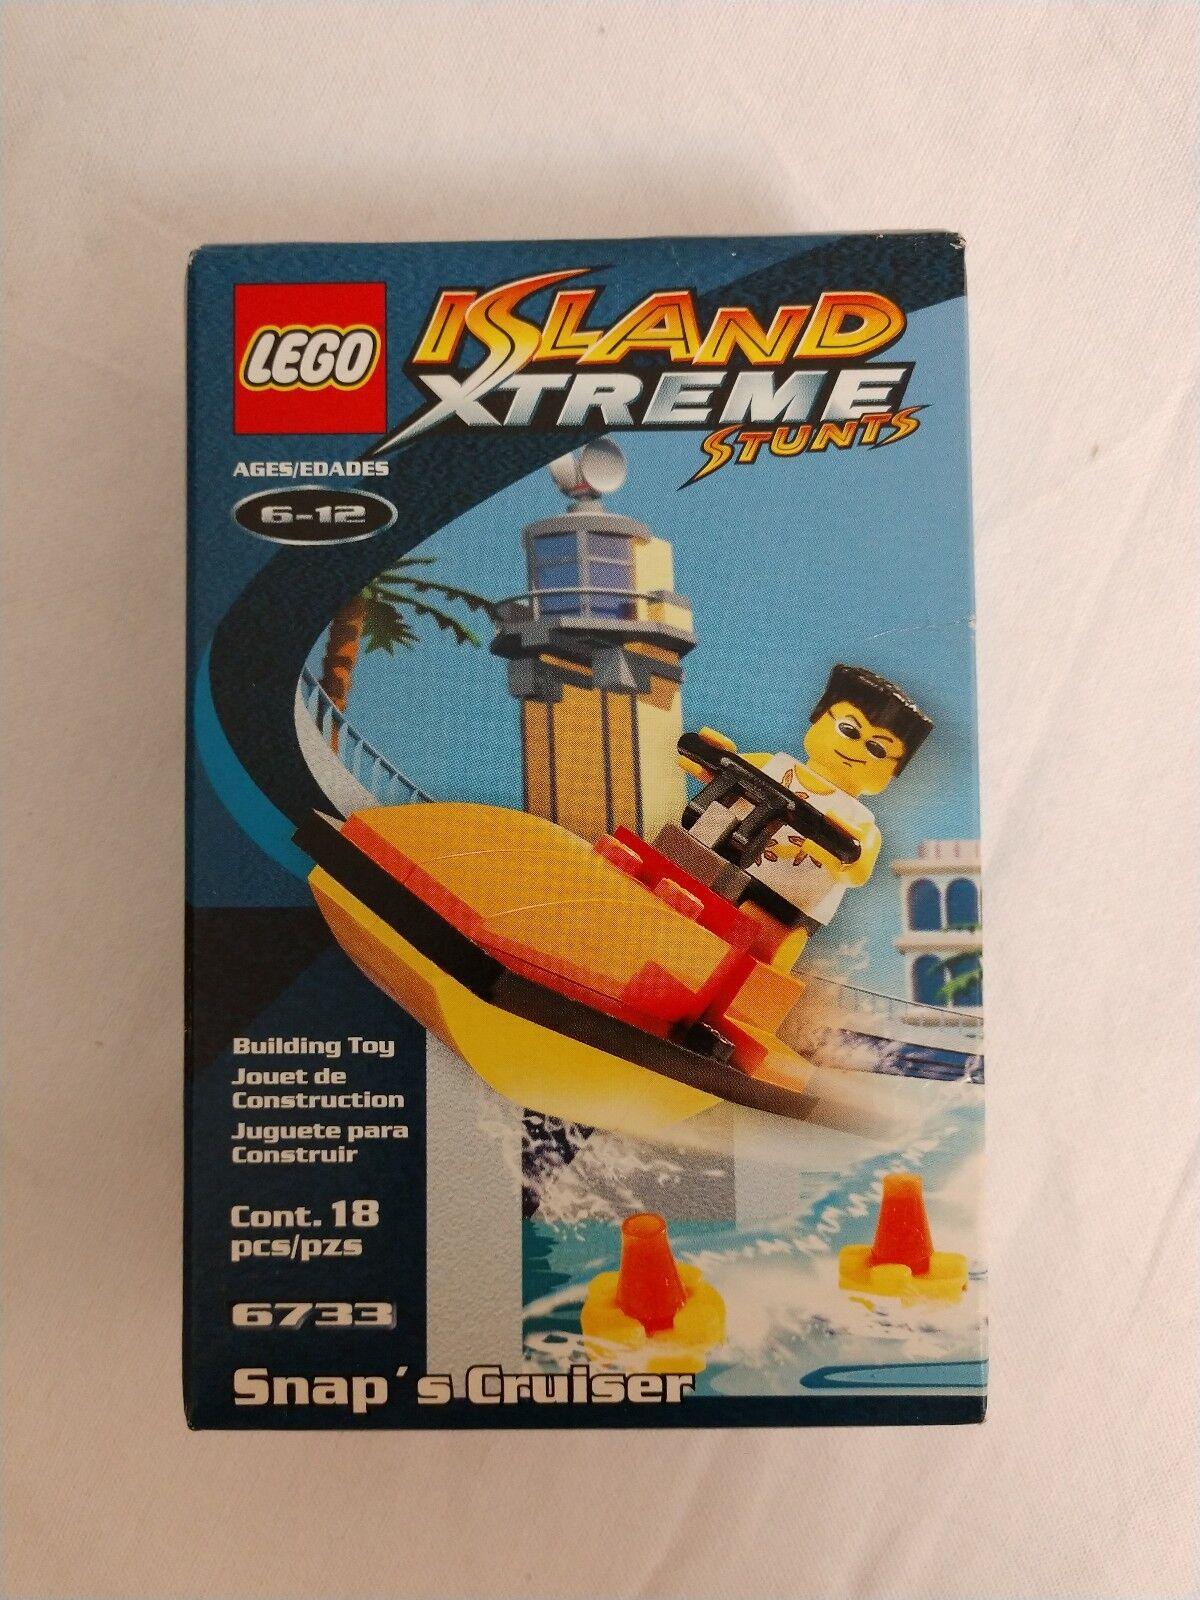 LEGO Island Xtreme Stunts 6733 Snap's Cruiser. Free Delivery